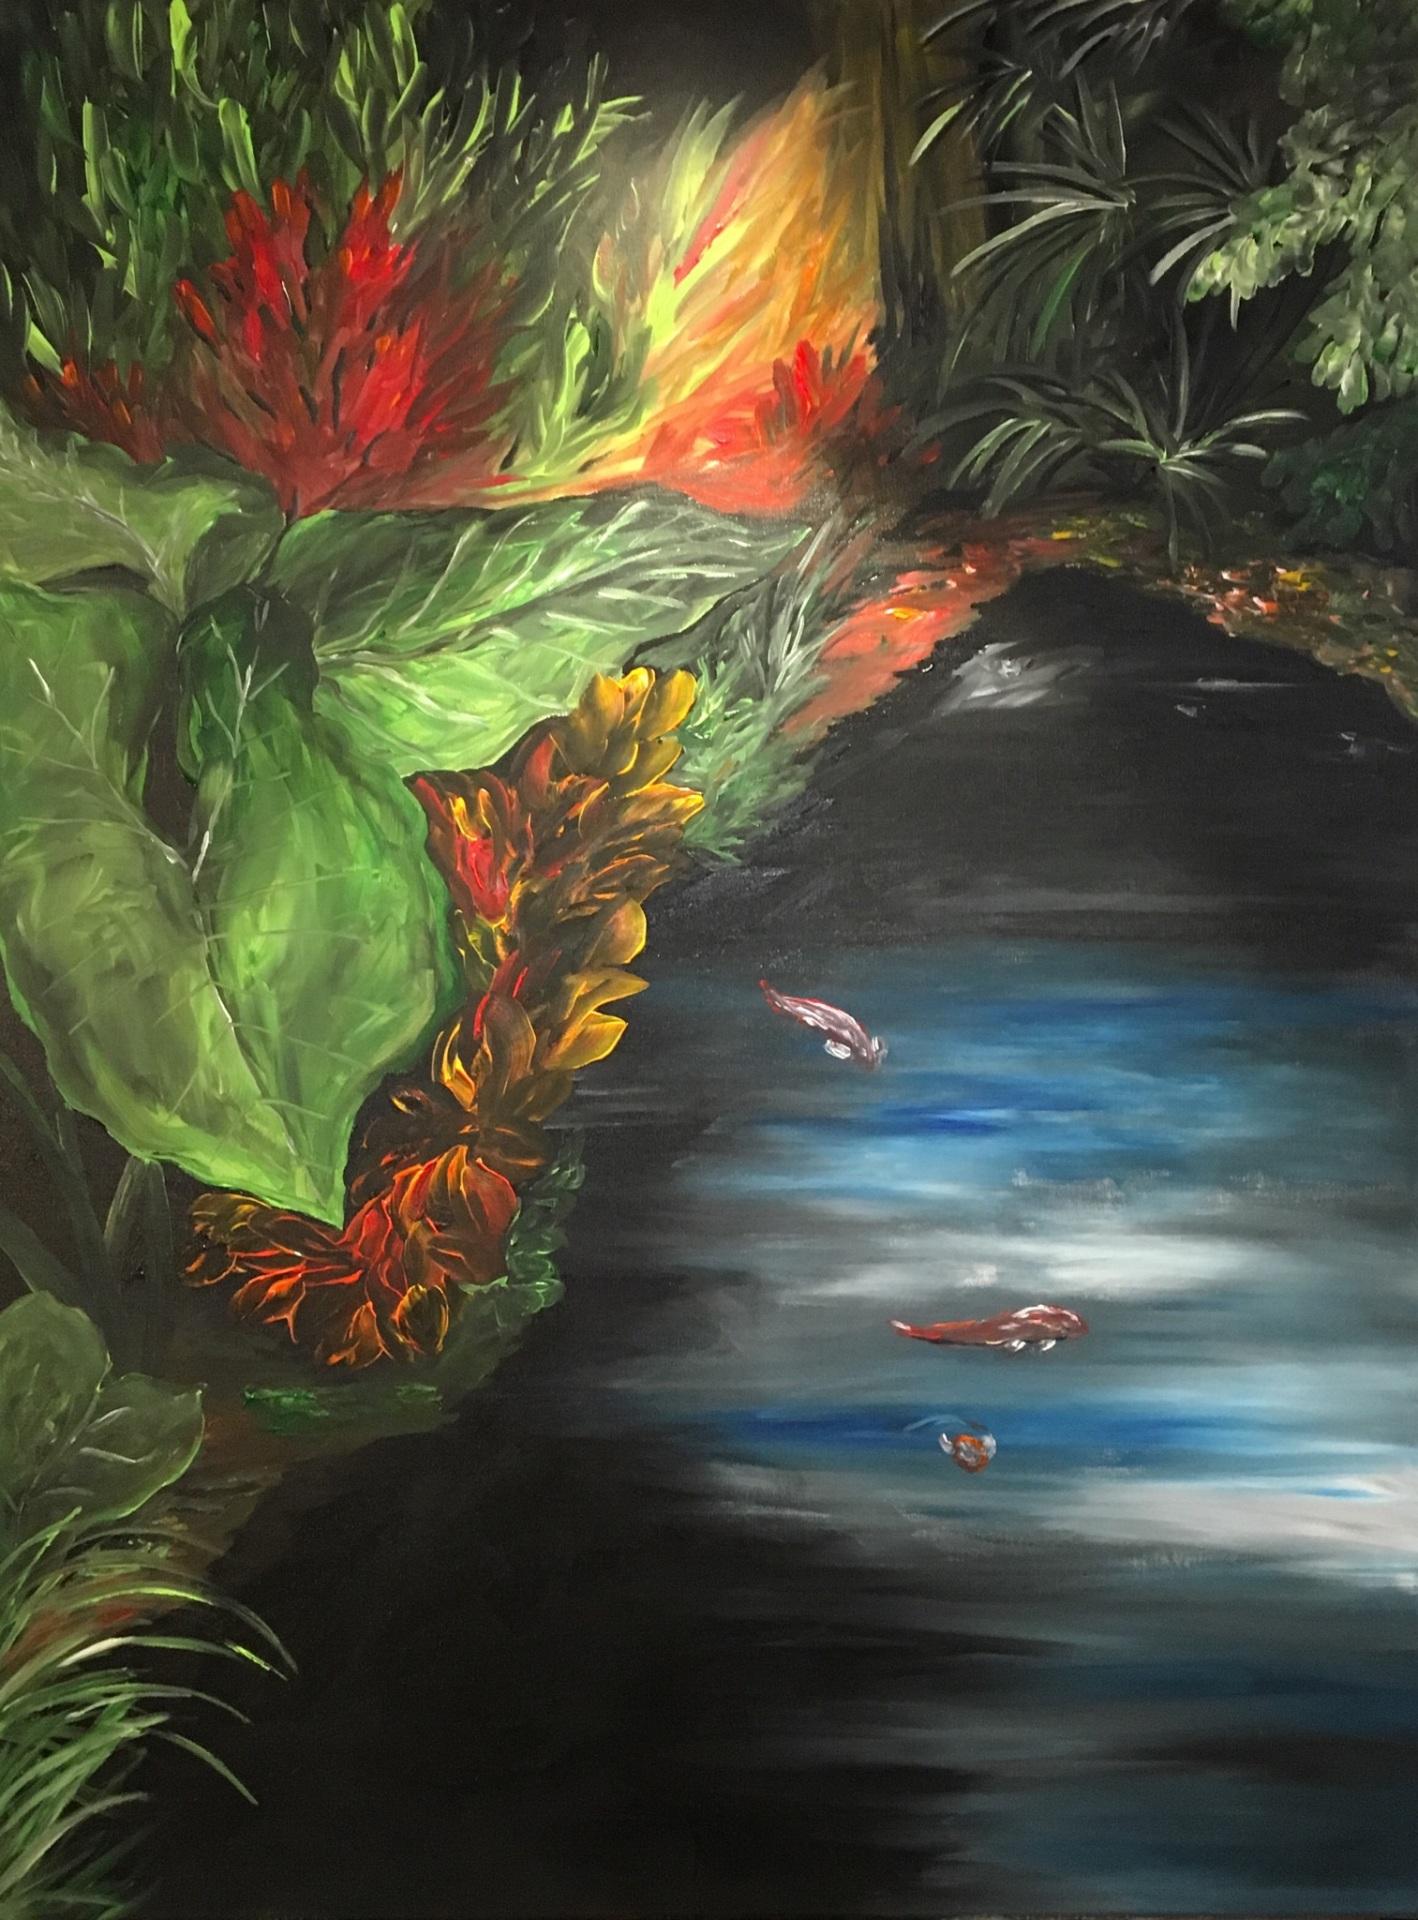 Sanctuary, acrylic on canvas, original by Artist Mindy Lichter.  MLICHTER fINE ART dESIGN.